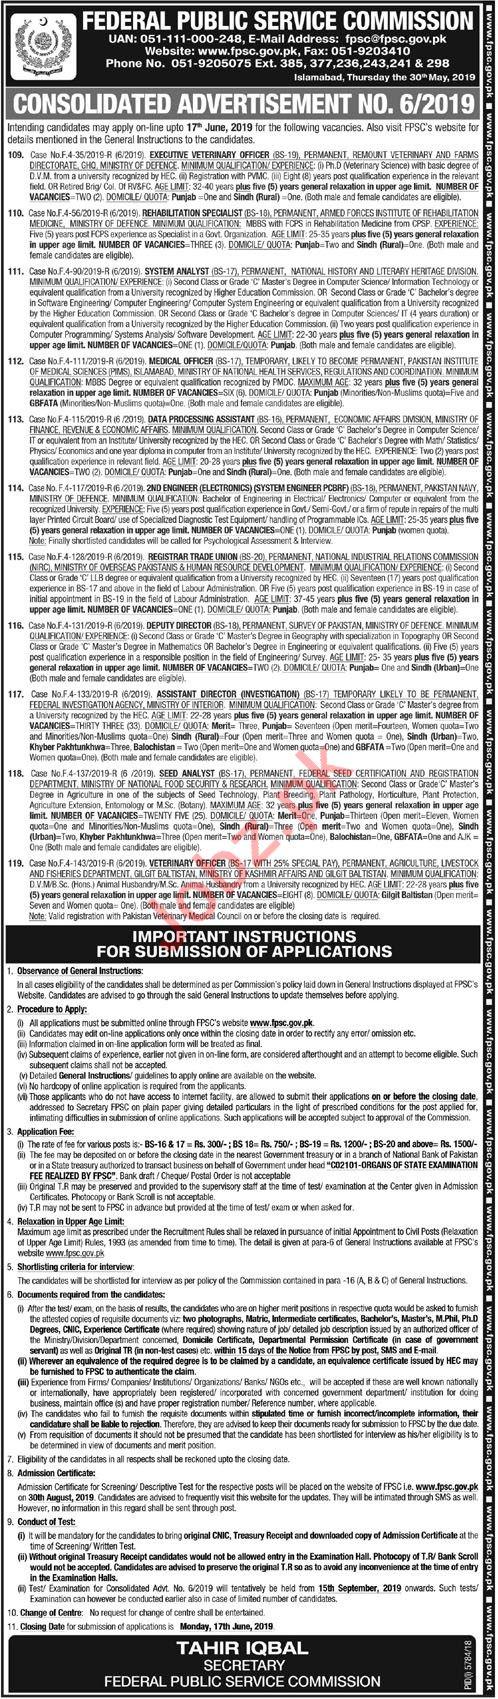 Federeal Public Services Commission FPSC Jobs 2019